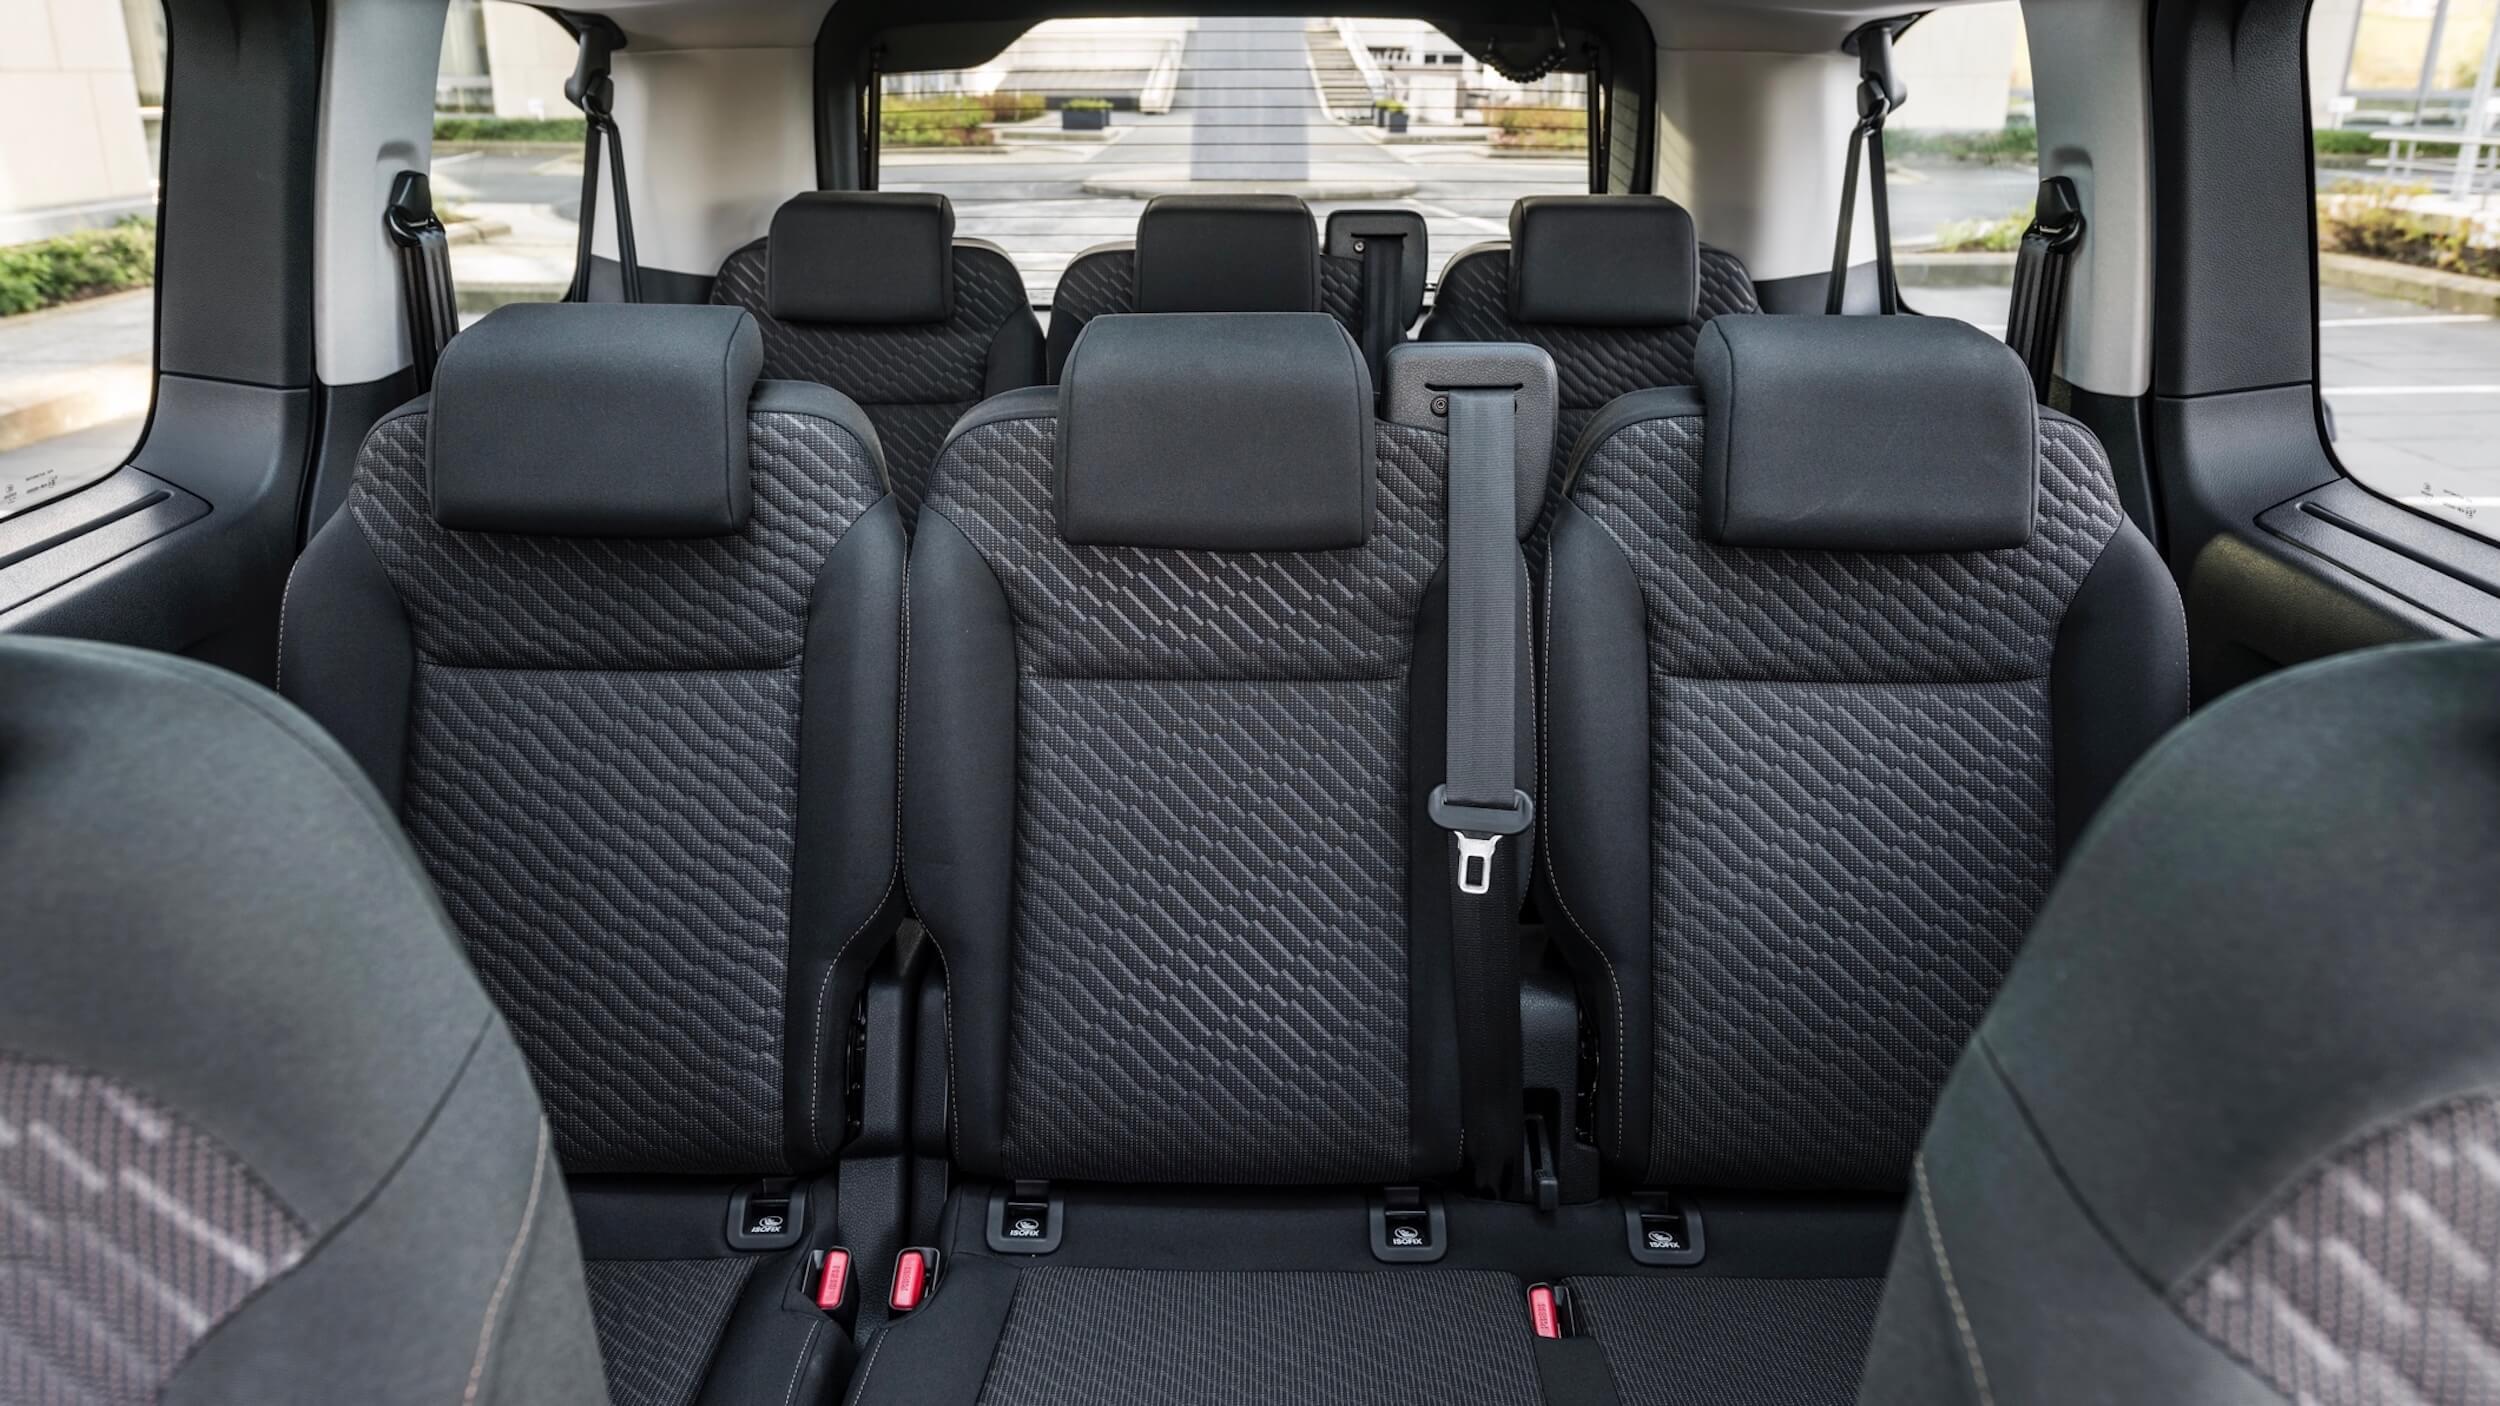 Toyota Proace Verso Electric zetels